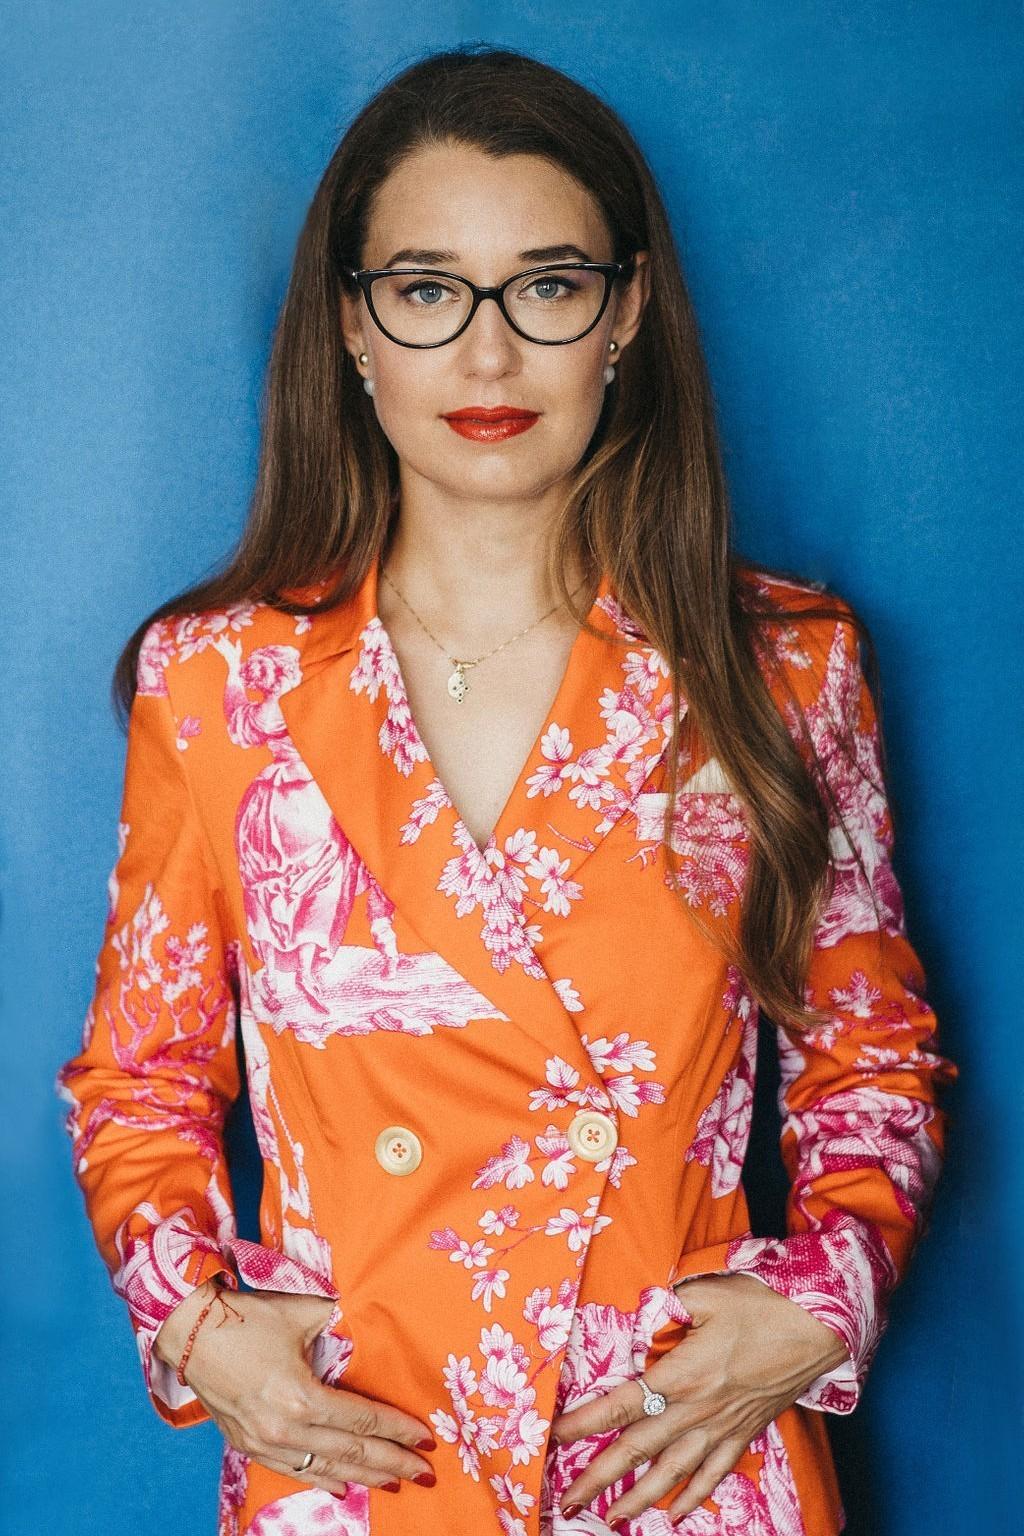 Aleksandra Lampka-Skowrońska